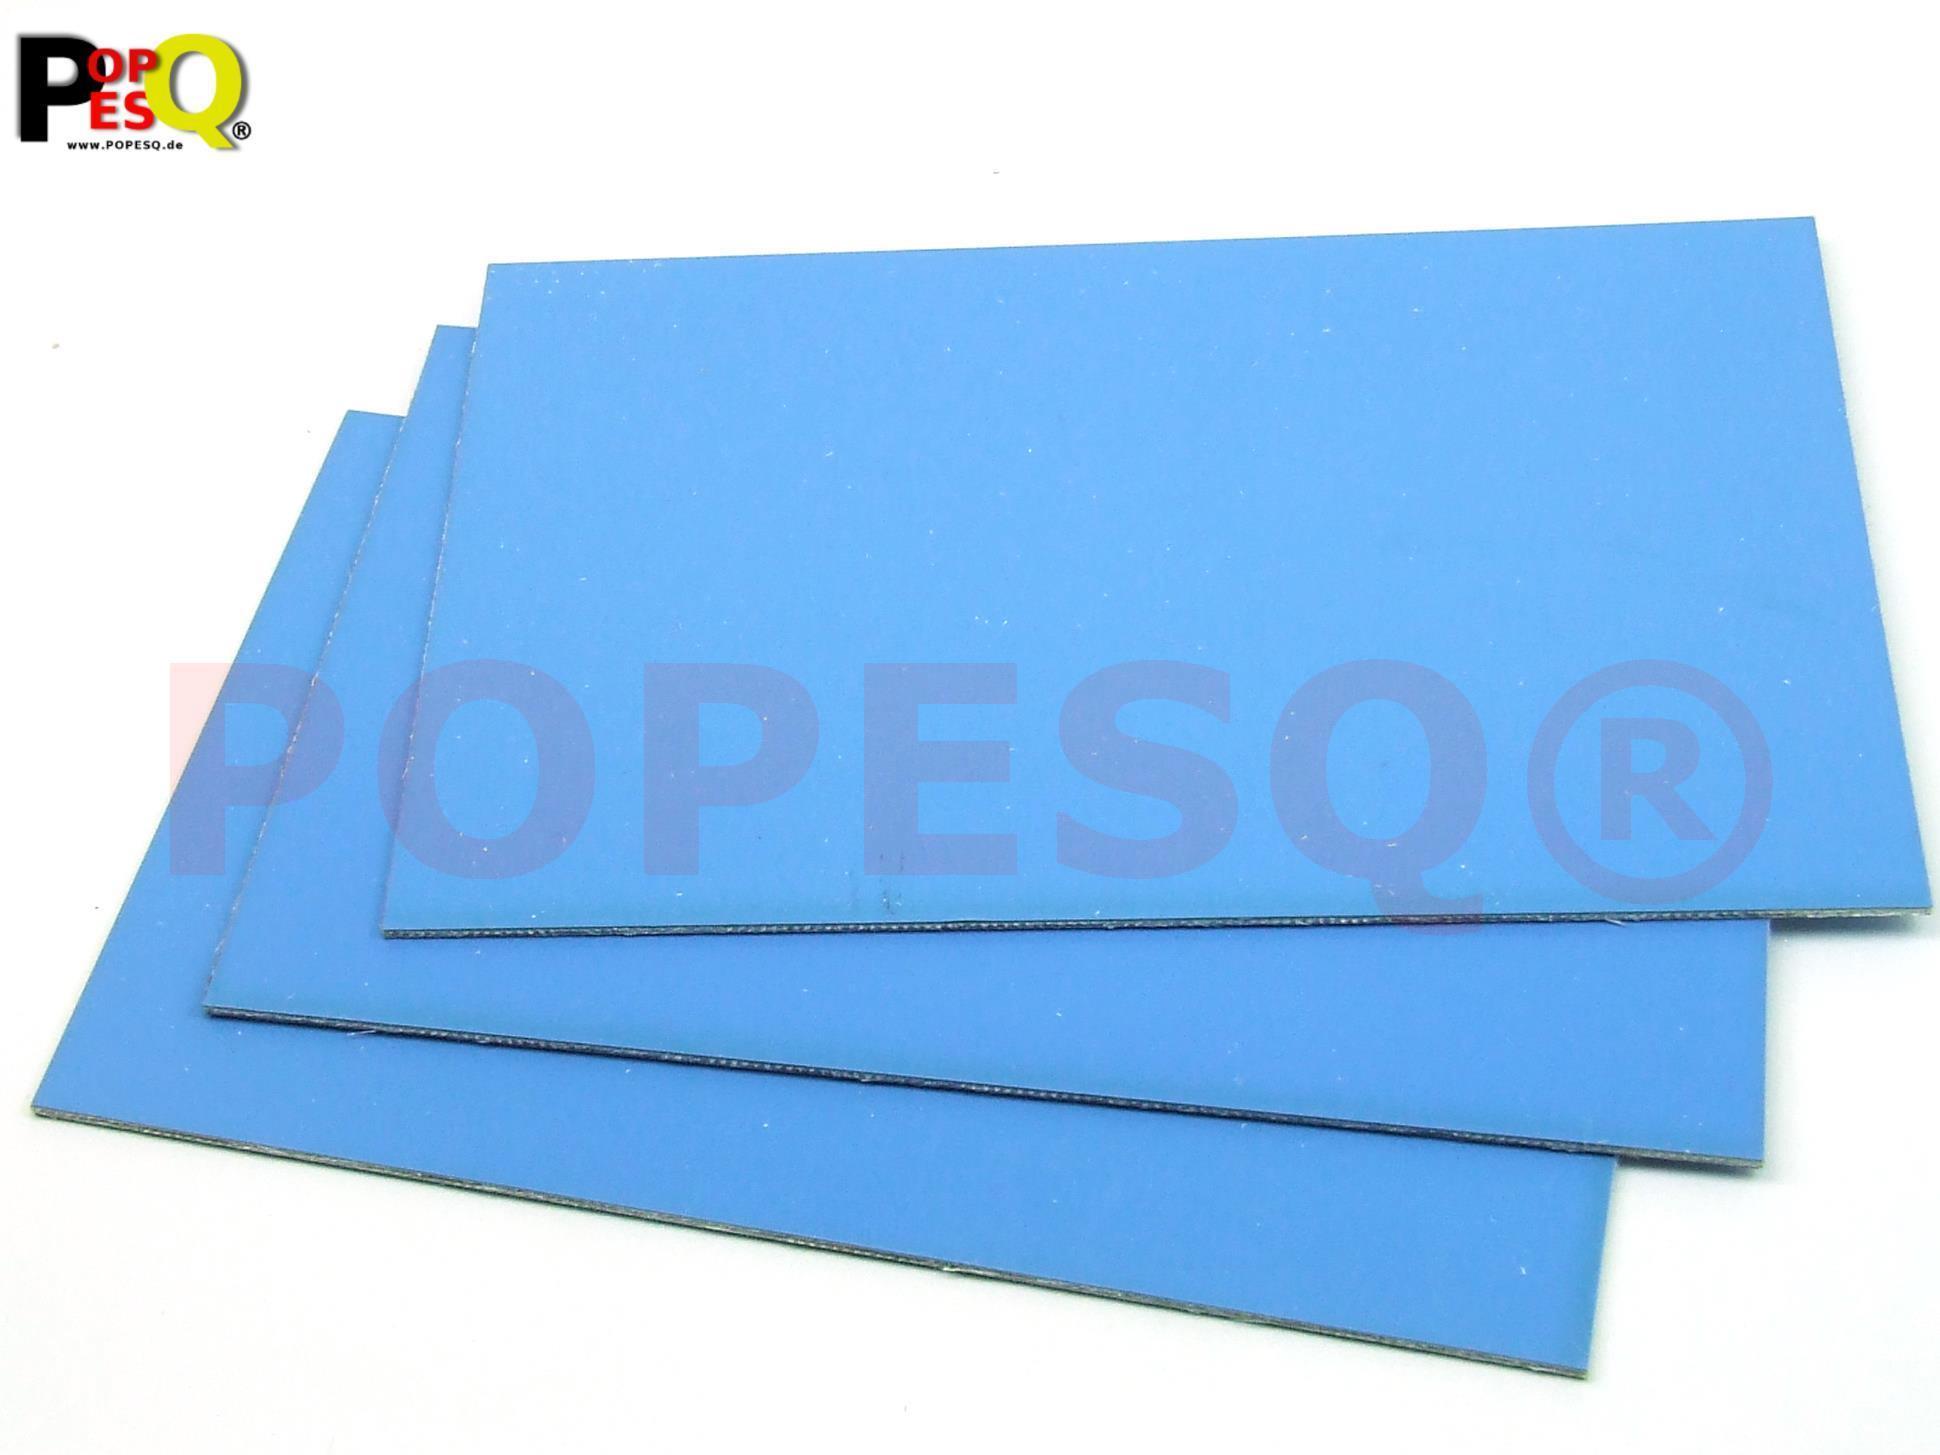 3 Stk x PCB Leiterplatte mit Fotolack 160x100mm 1.5mm FR4 Einseitig #A1889